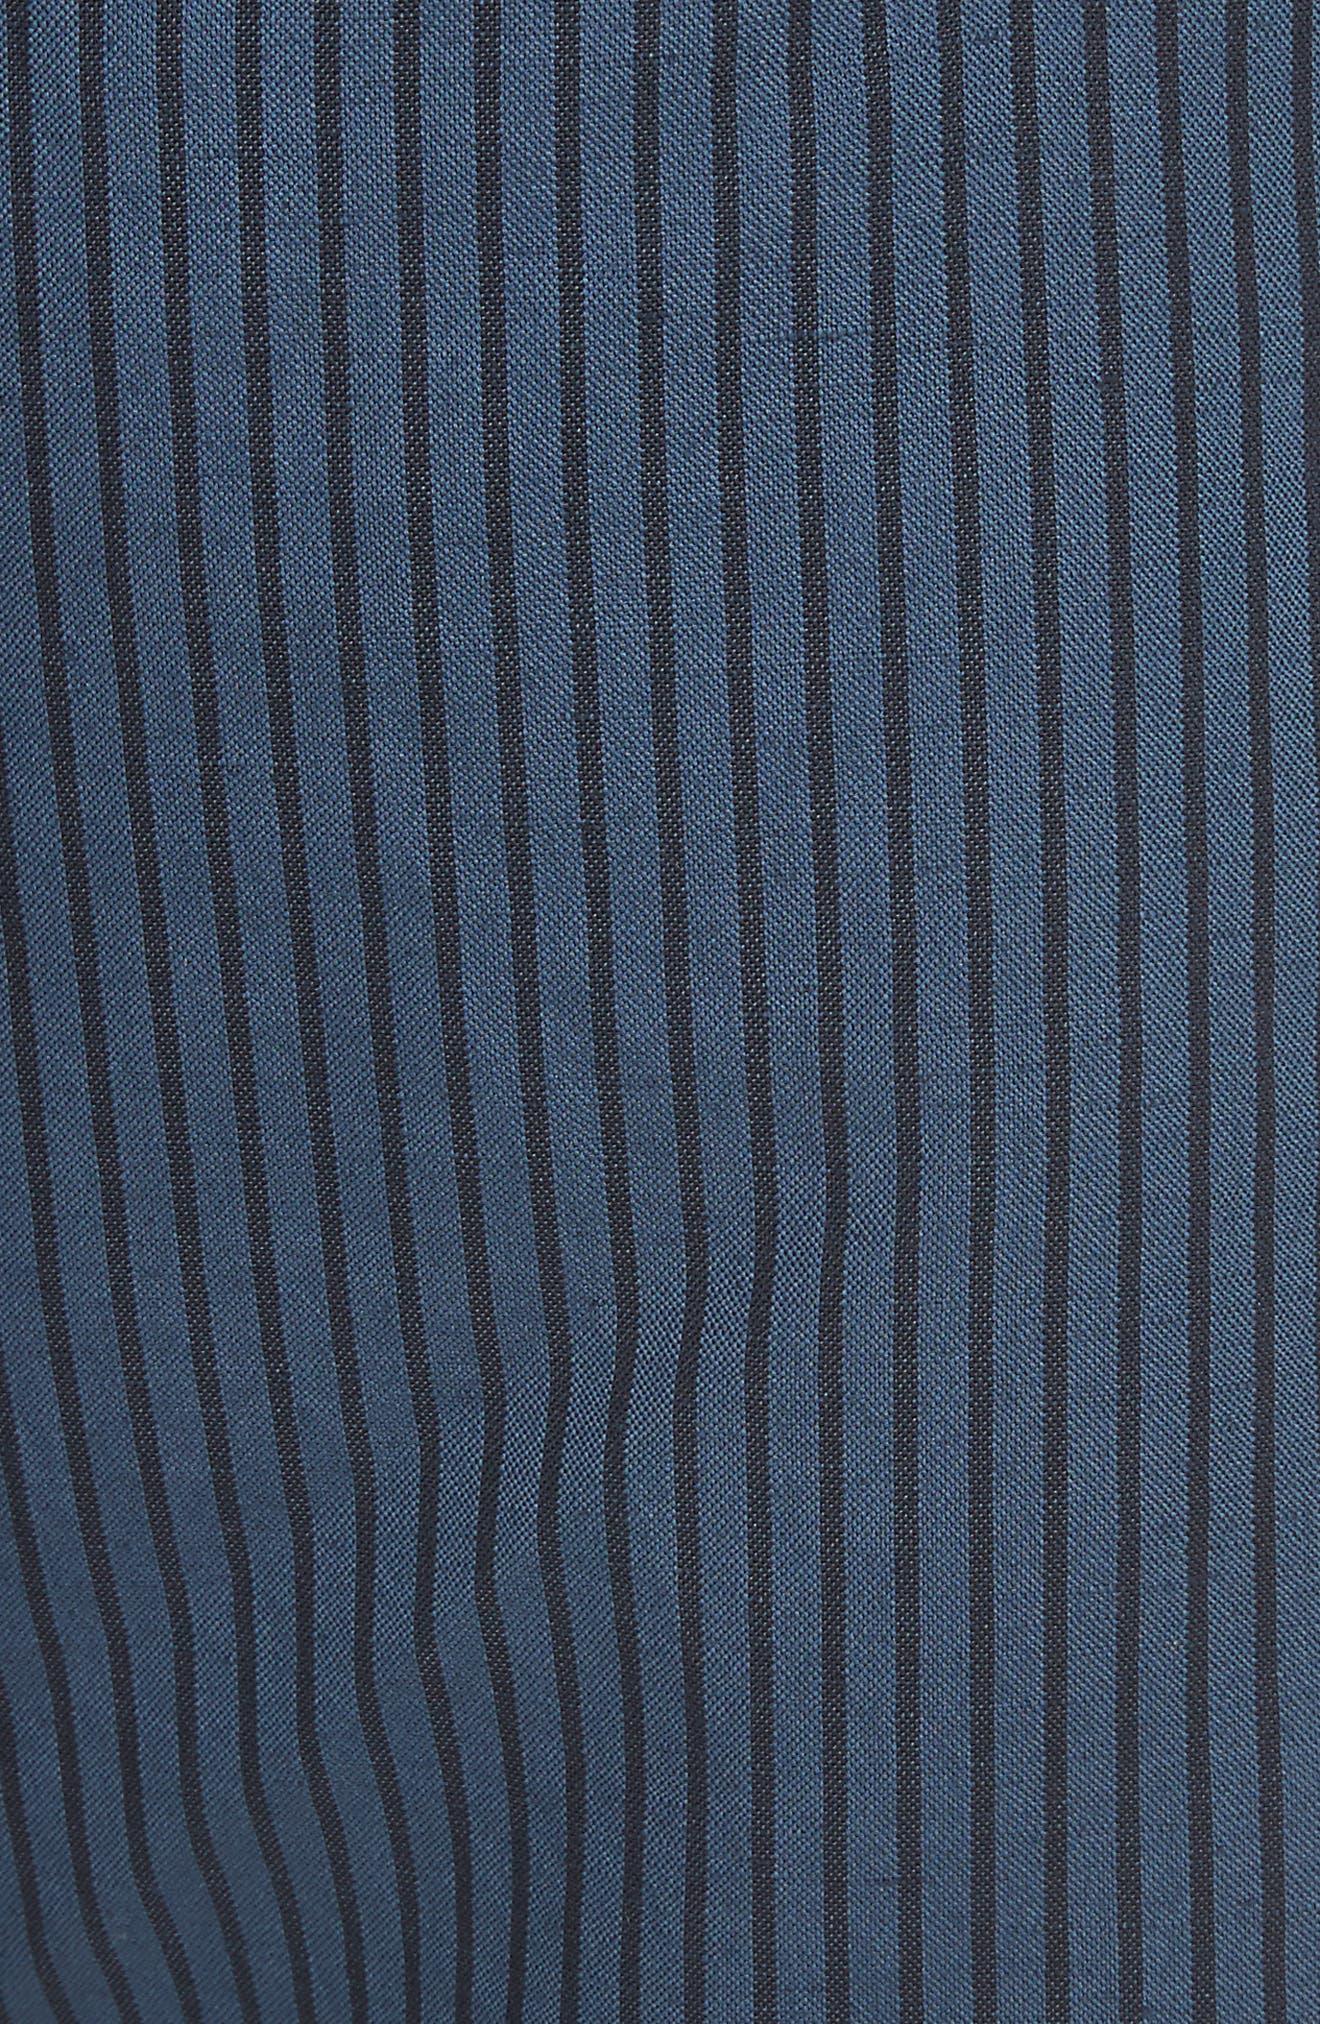 rag + bone Stripe Shorts,                             Alternate thumbnail 5, color,                             416